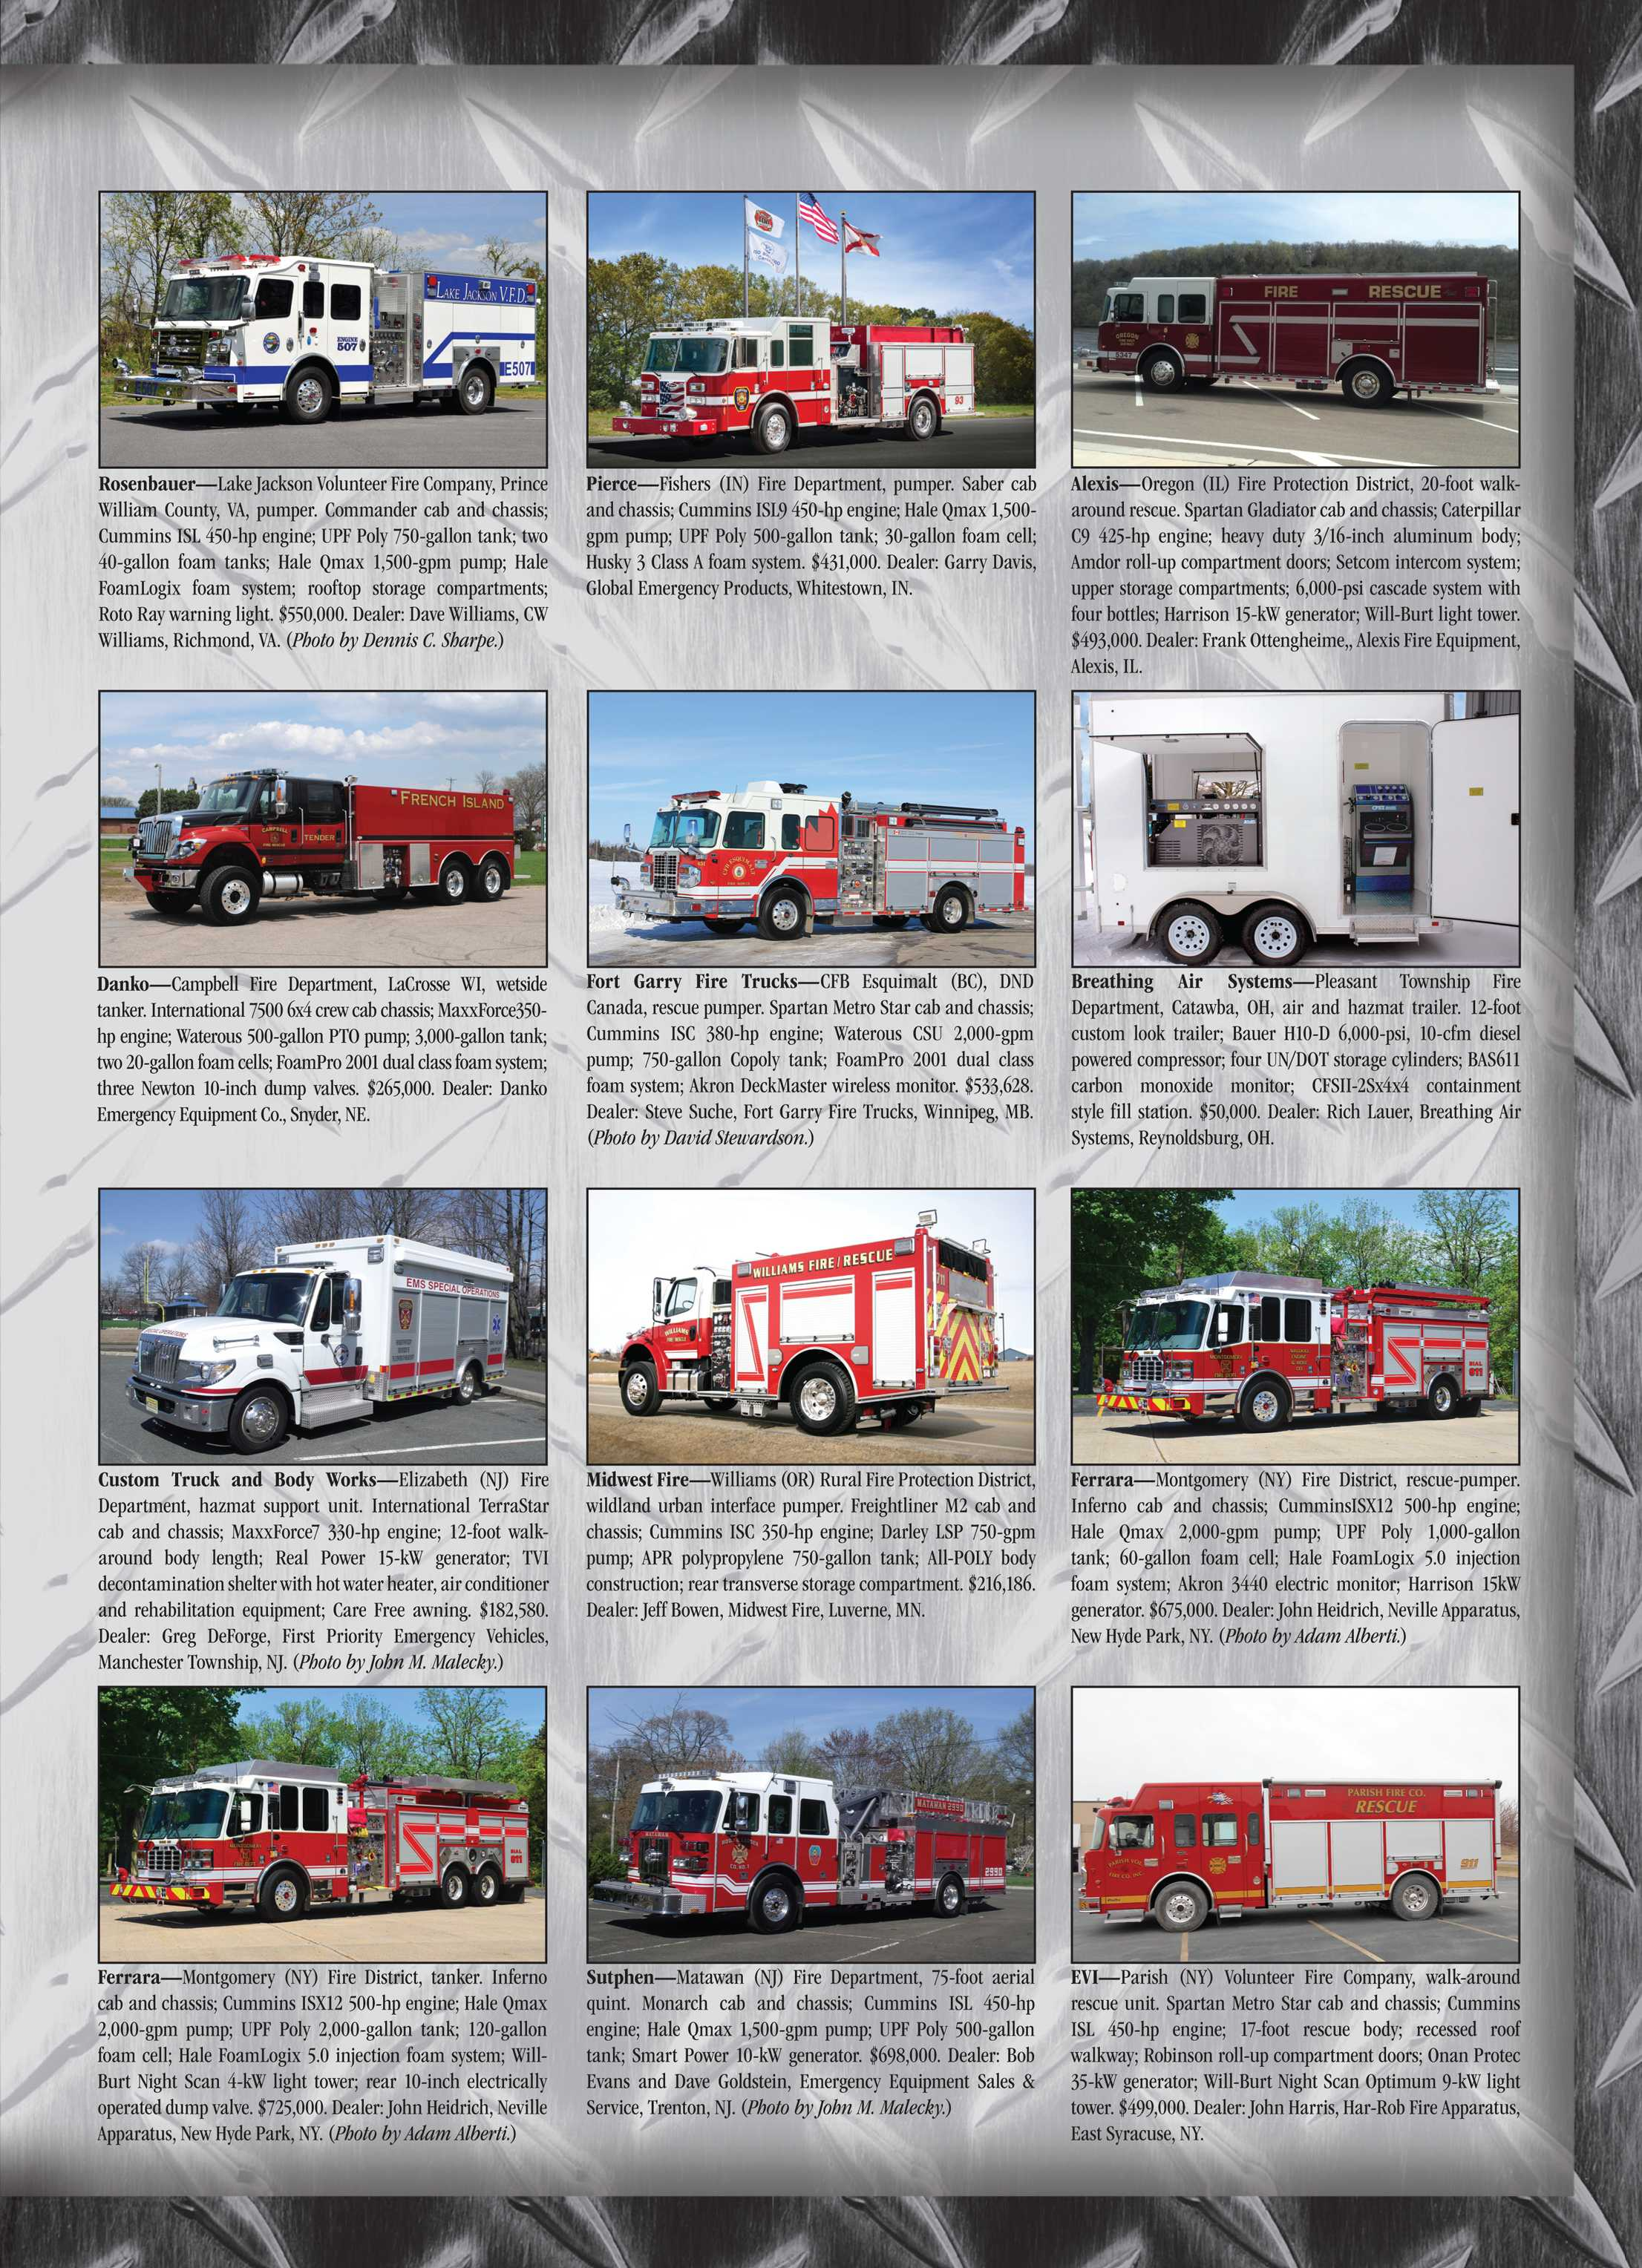 Fire Apparatus Magazine - July 2013 - page 35